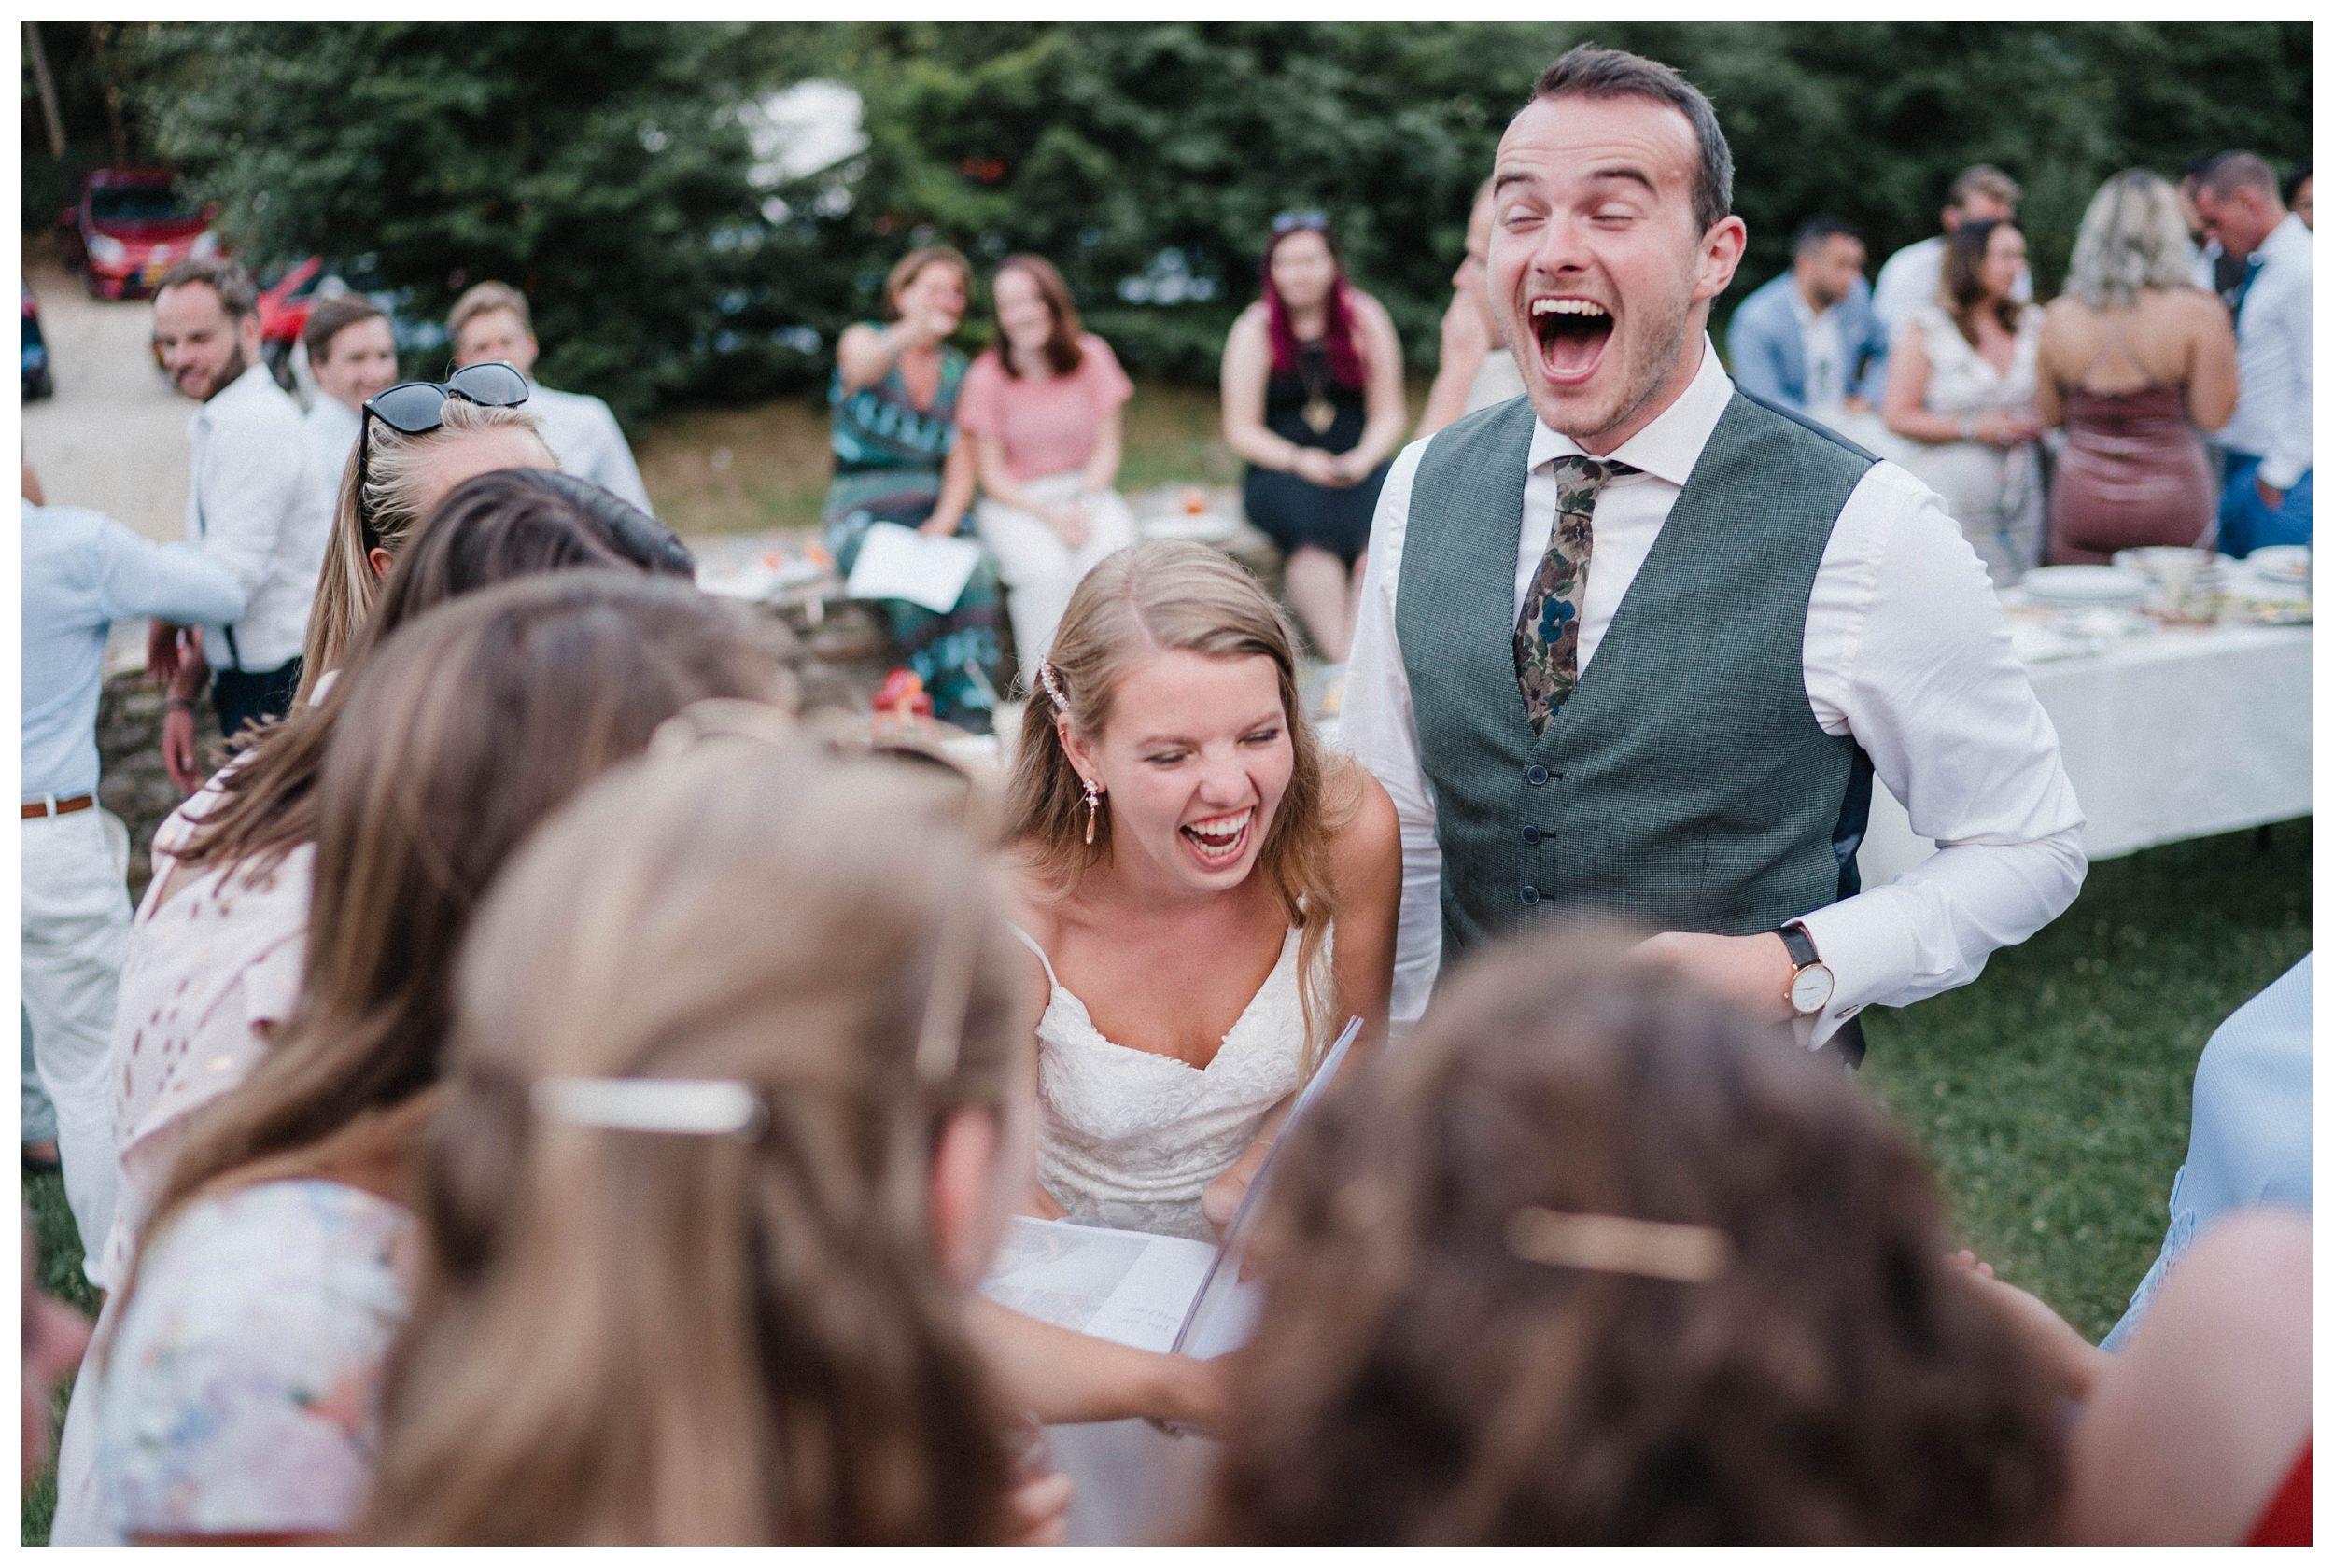 huwelijksfotograaf bruidsfotograaf destinationwedding huwelijksfotografie in ardennen nederland (88).jpg